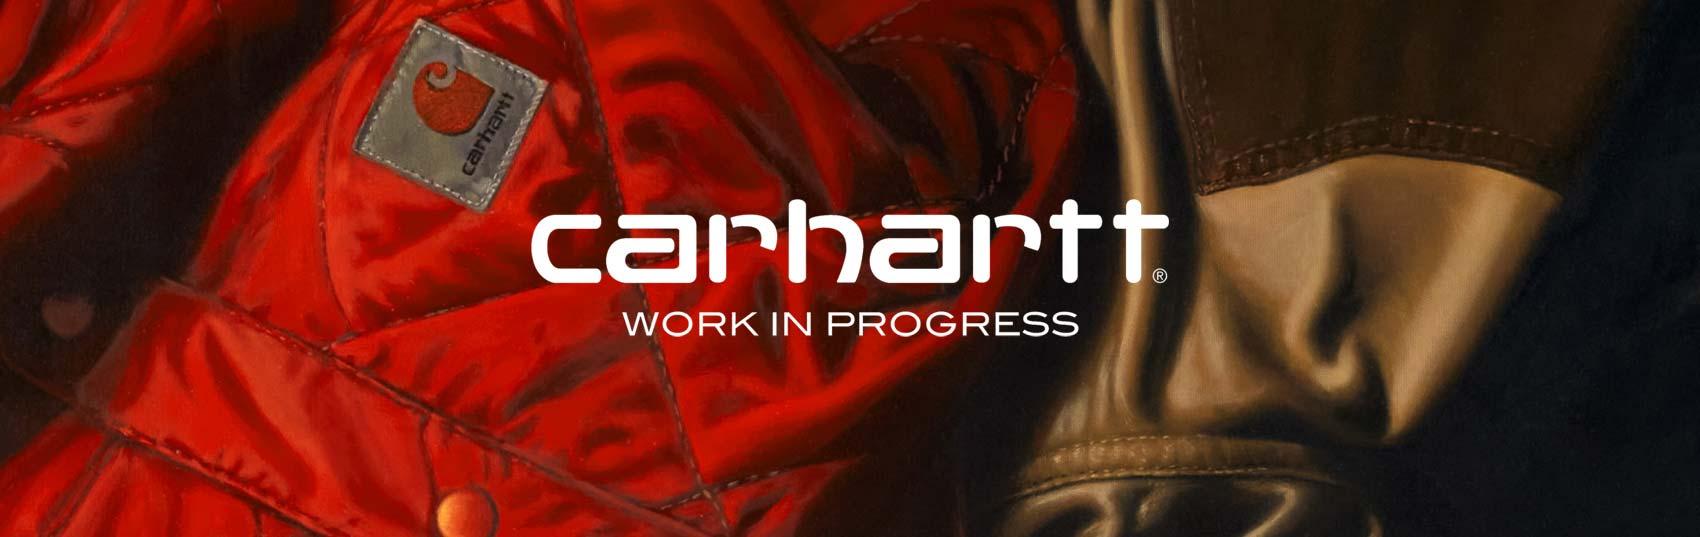 CARHARTT WINTER 2022